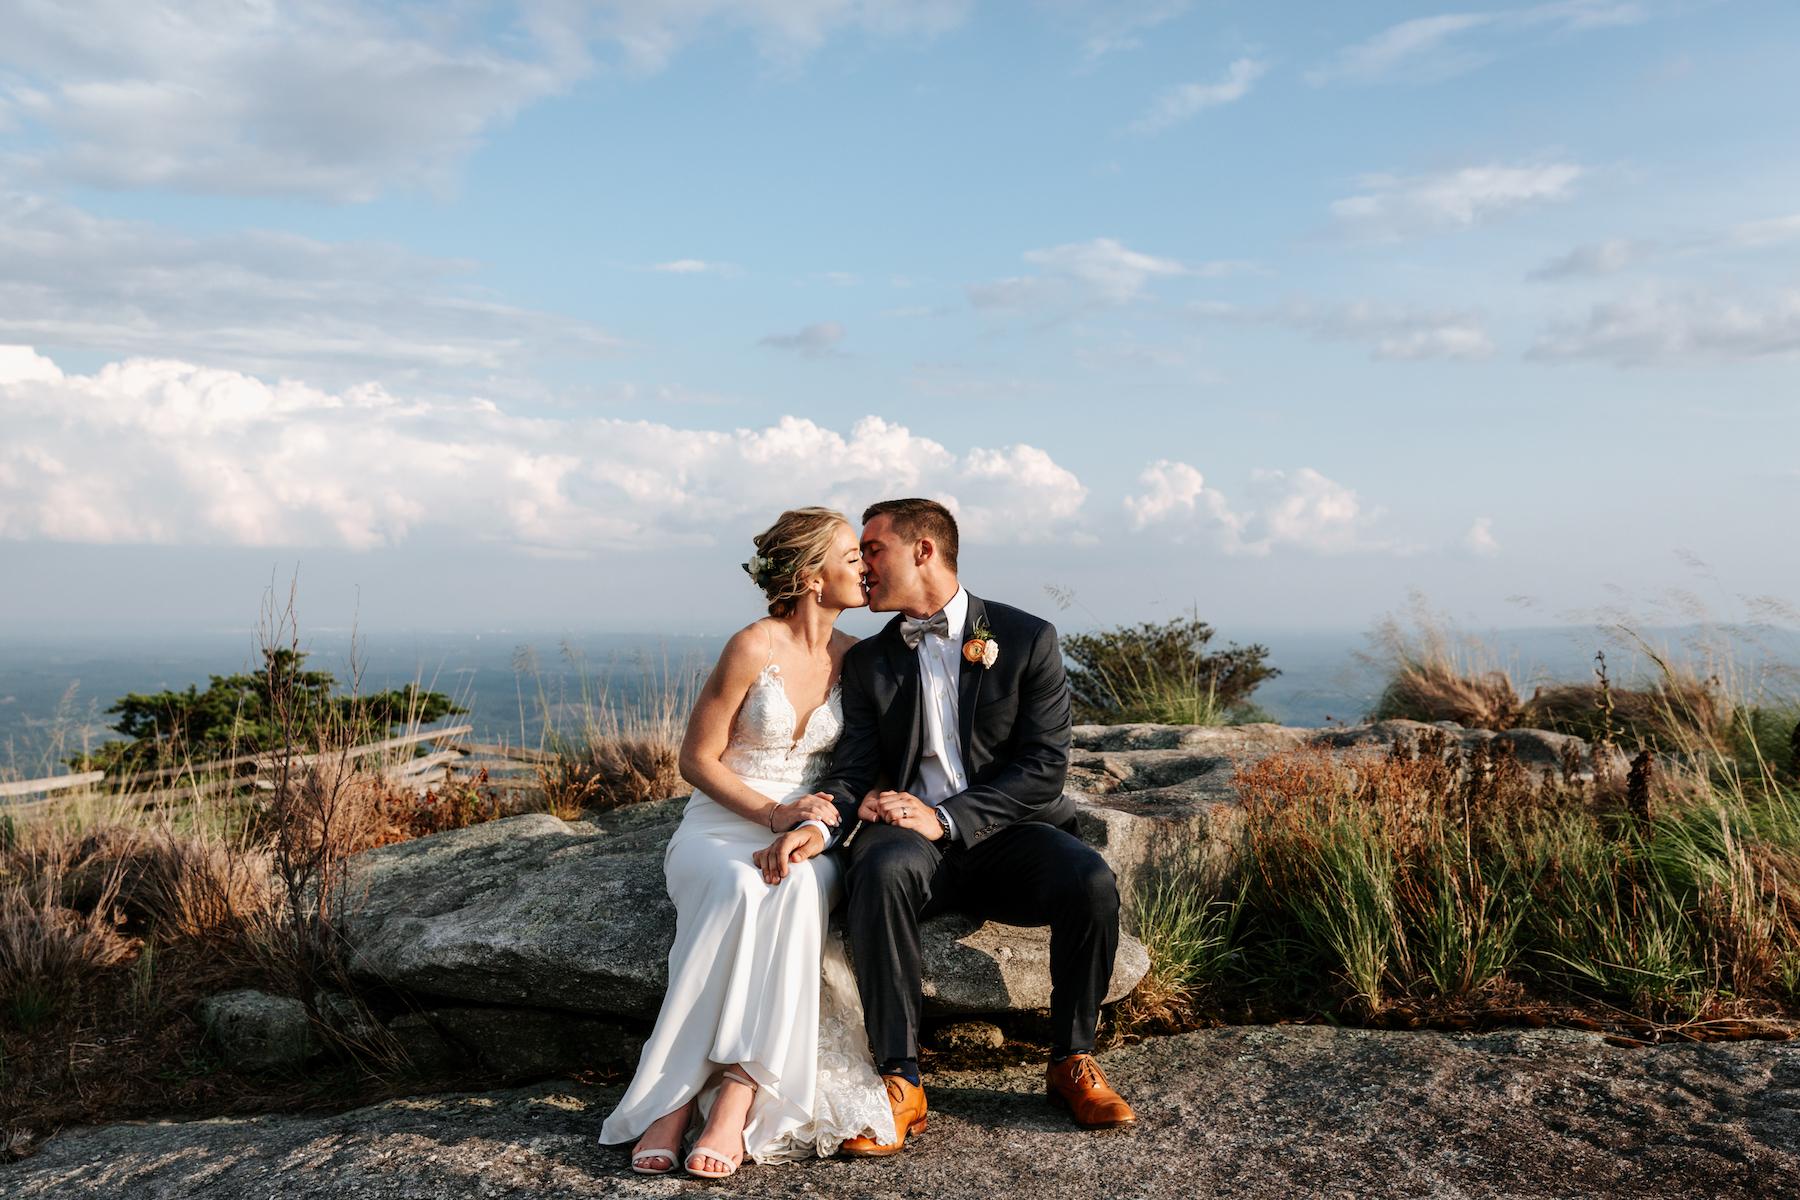 wedding-engagement-photographer-spartanburg-greenville-columbia-carolina-south-north-524.JPG